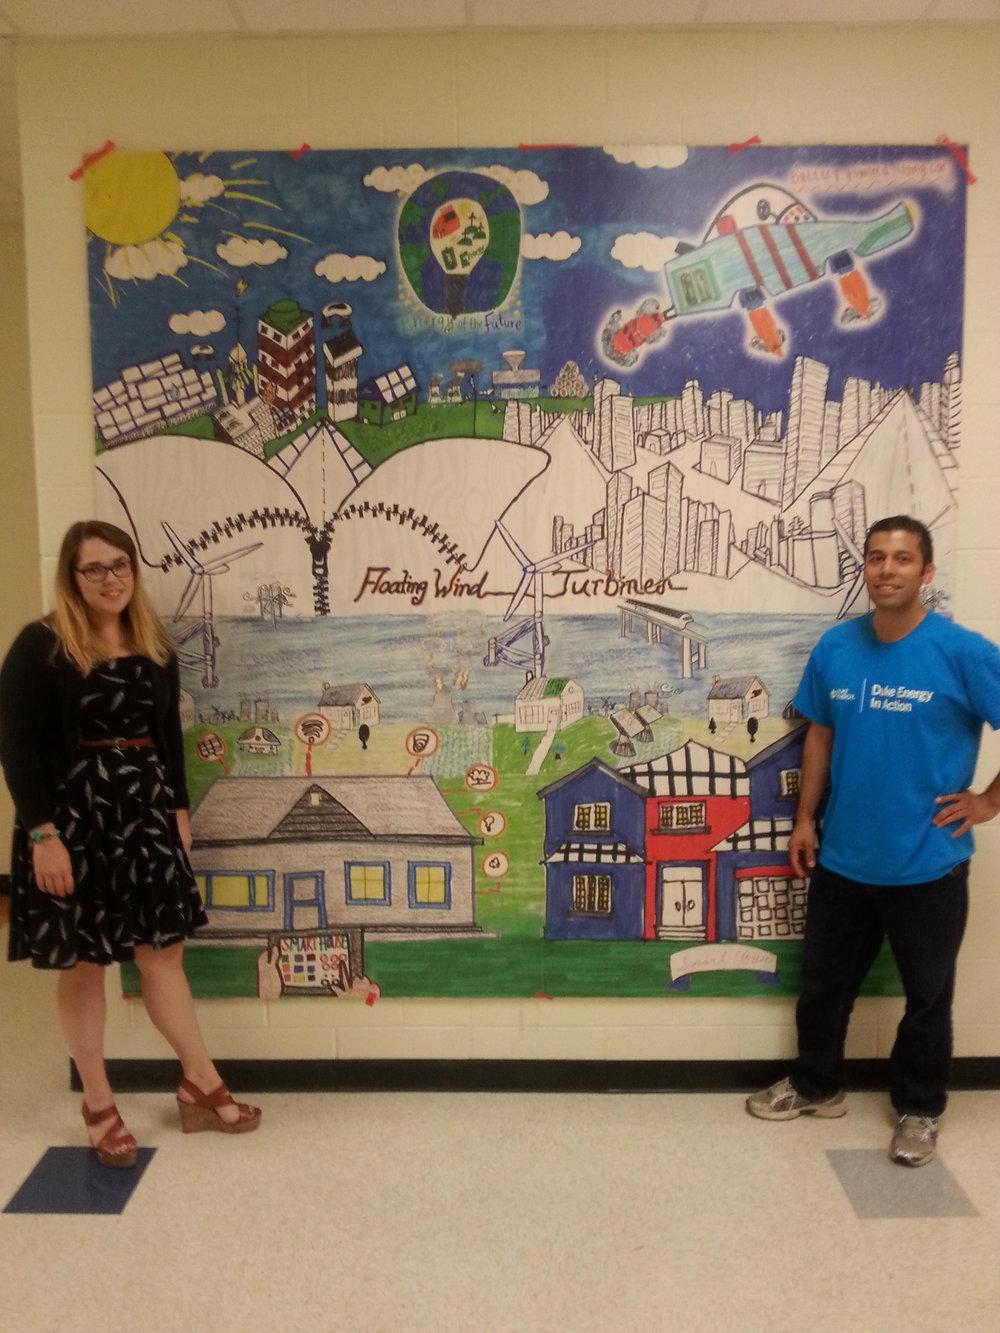 Duke-Energy-Mural-2-Art-Julio-Gonzalez.jpg